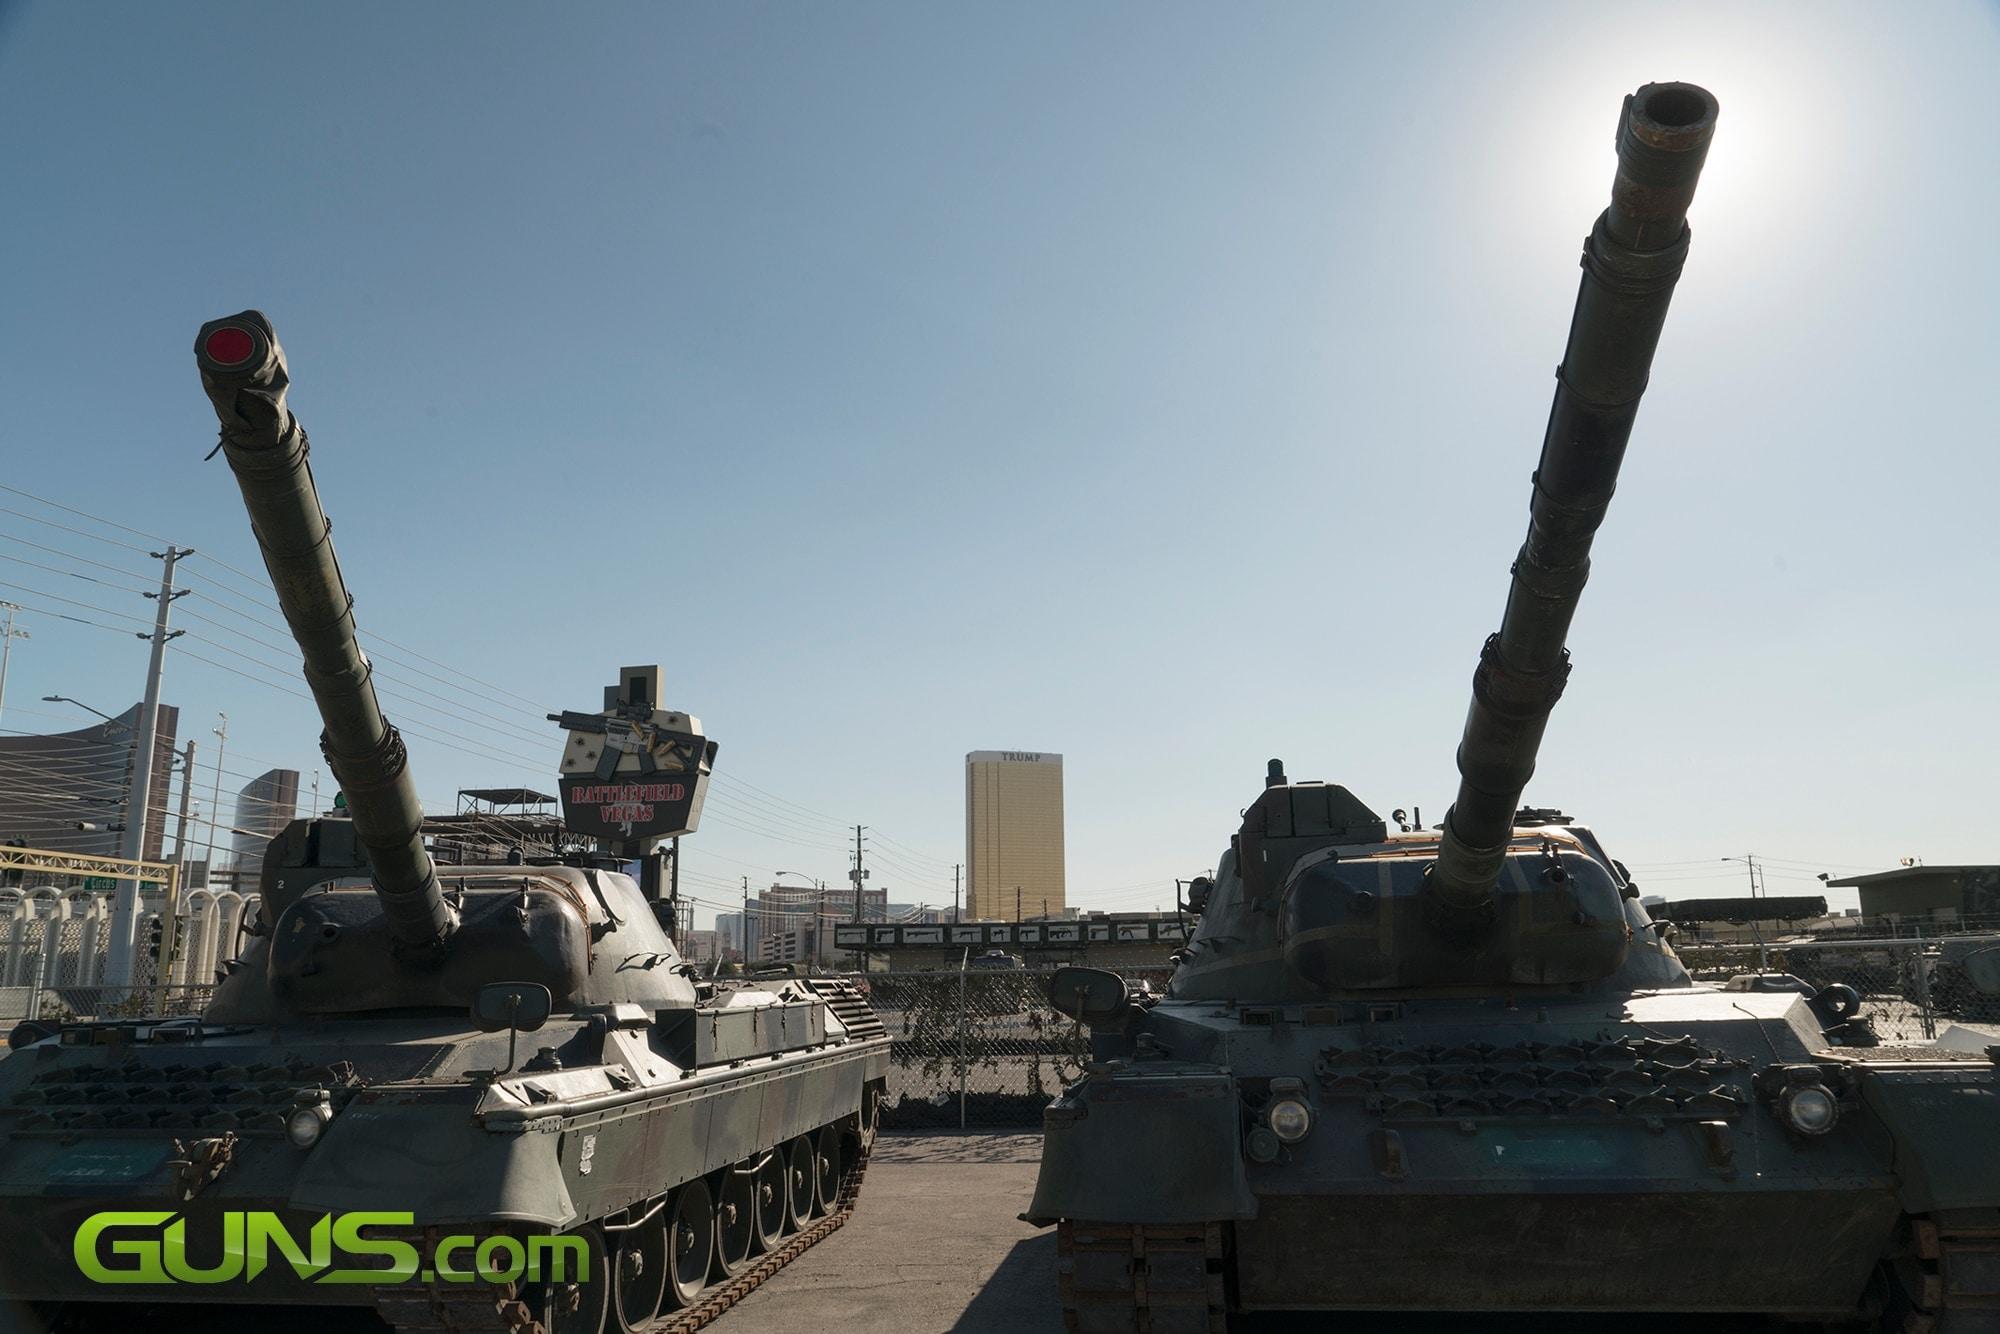 German Leopard 1 MBT tanks